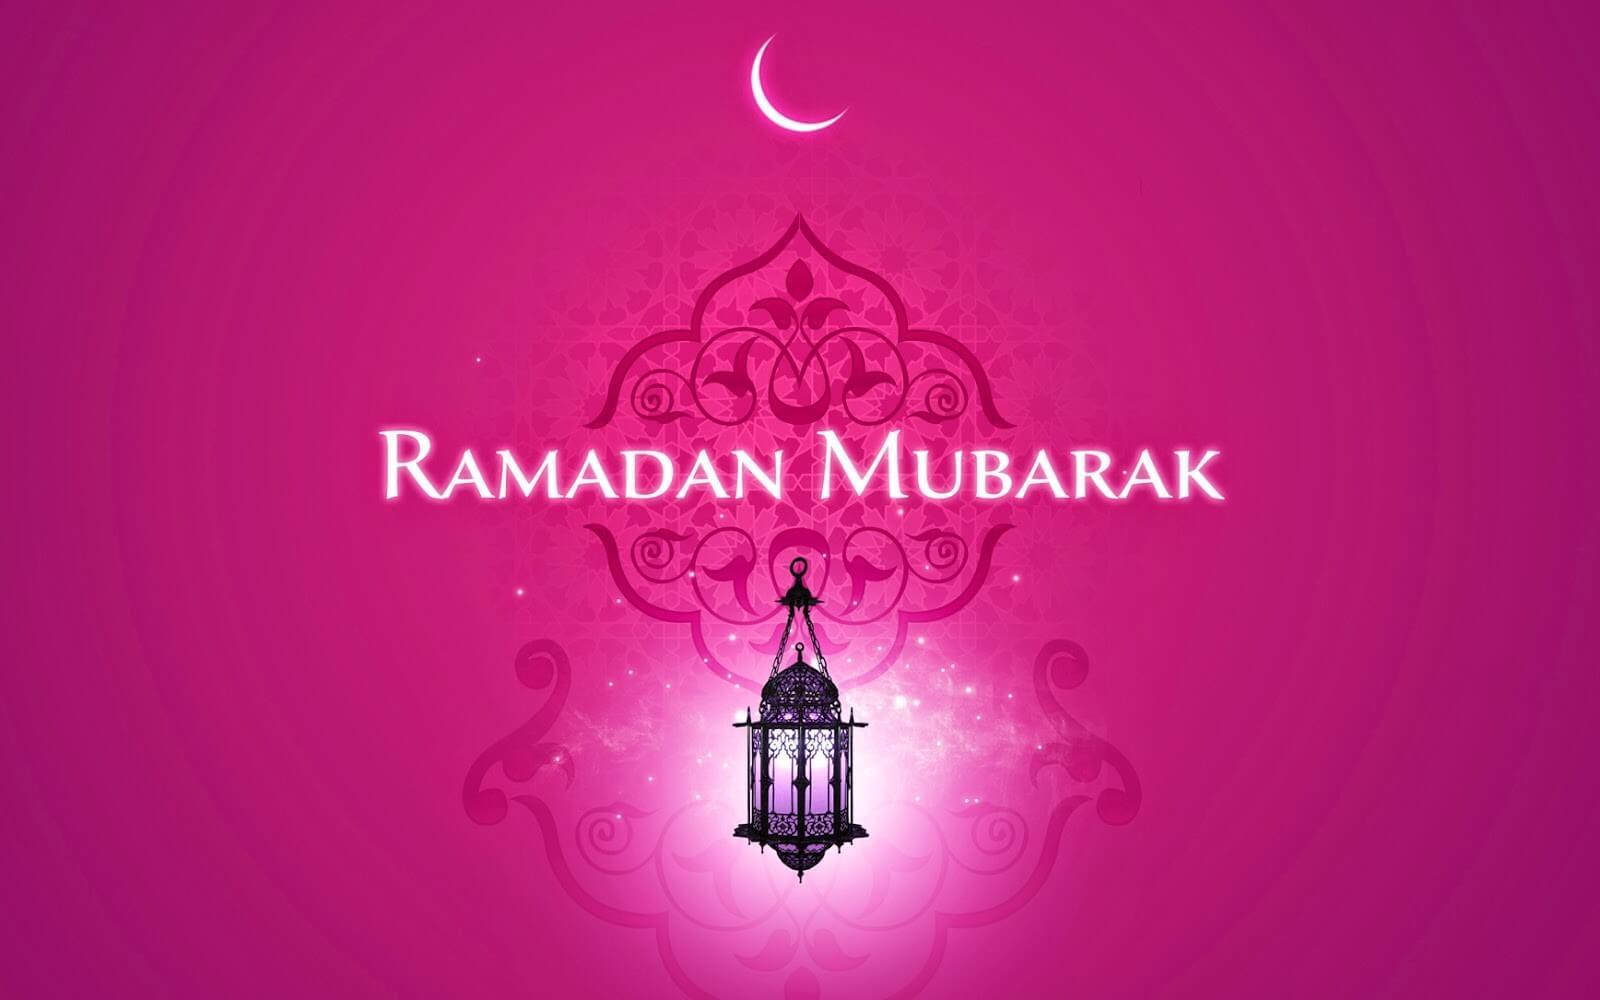 happy ramadan ramzan wishes wallpaper